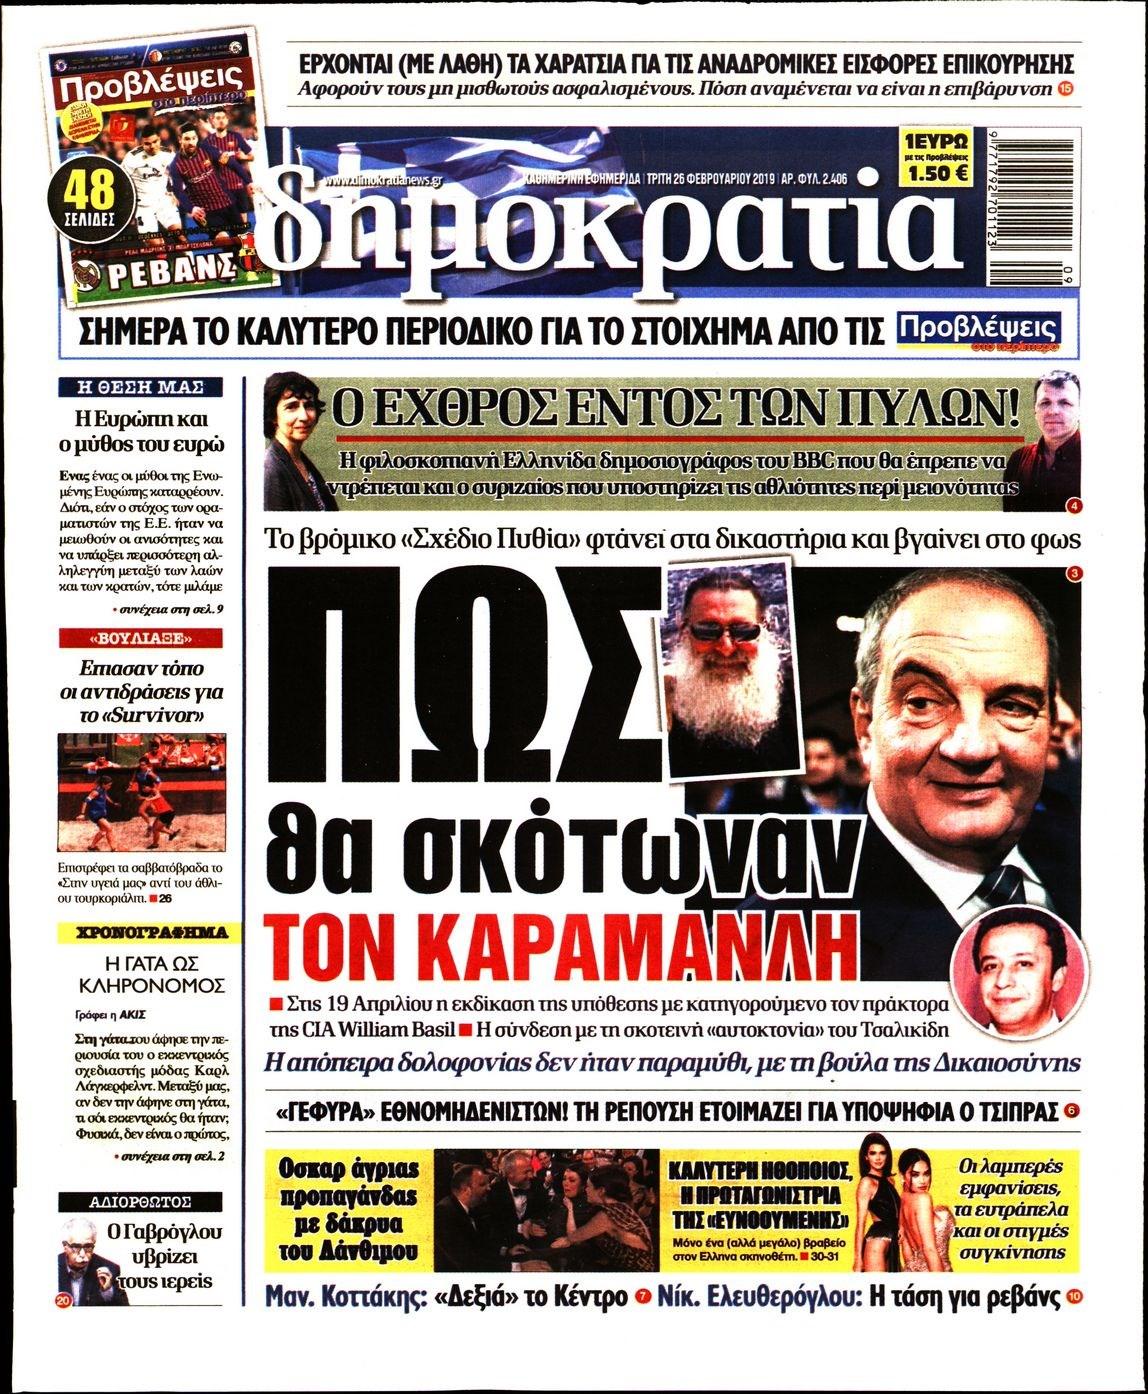 http://media.enikos.gr/data/photos/628968_ecd1fc2fad-a7ca8d47294957e6.jpg